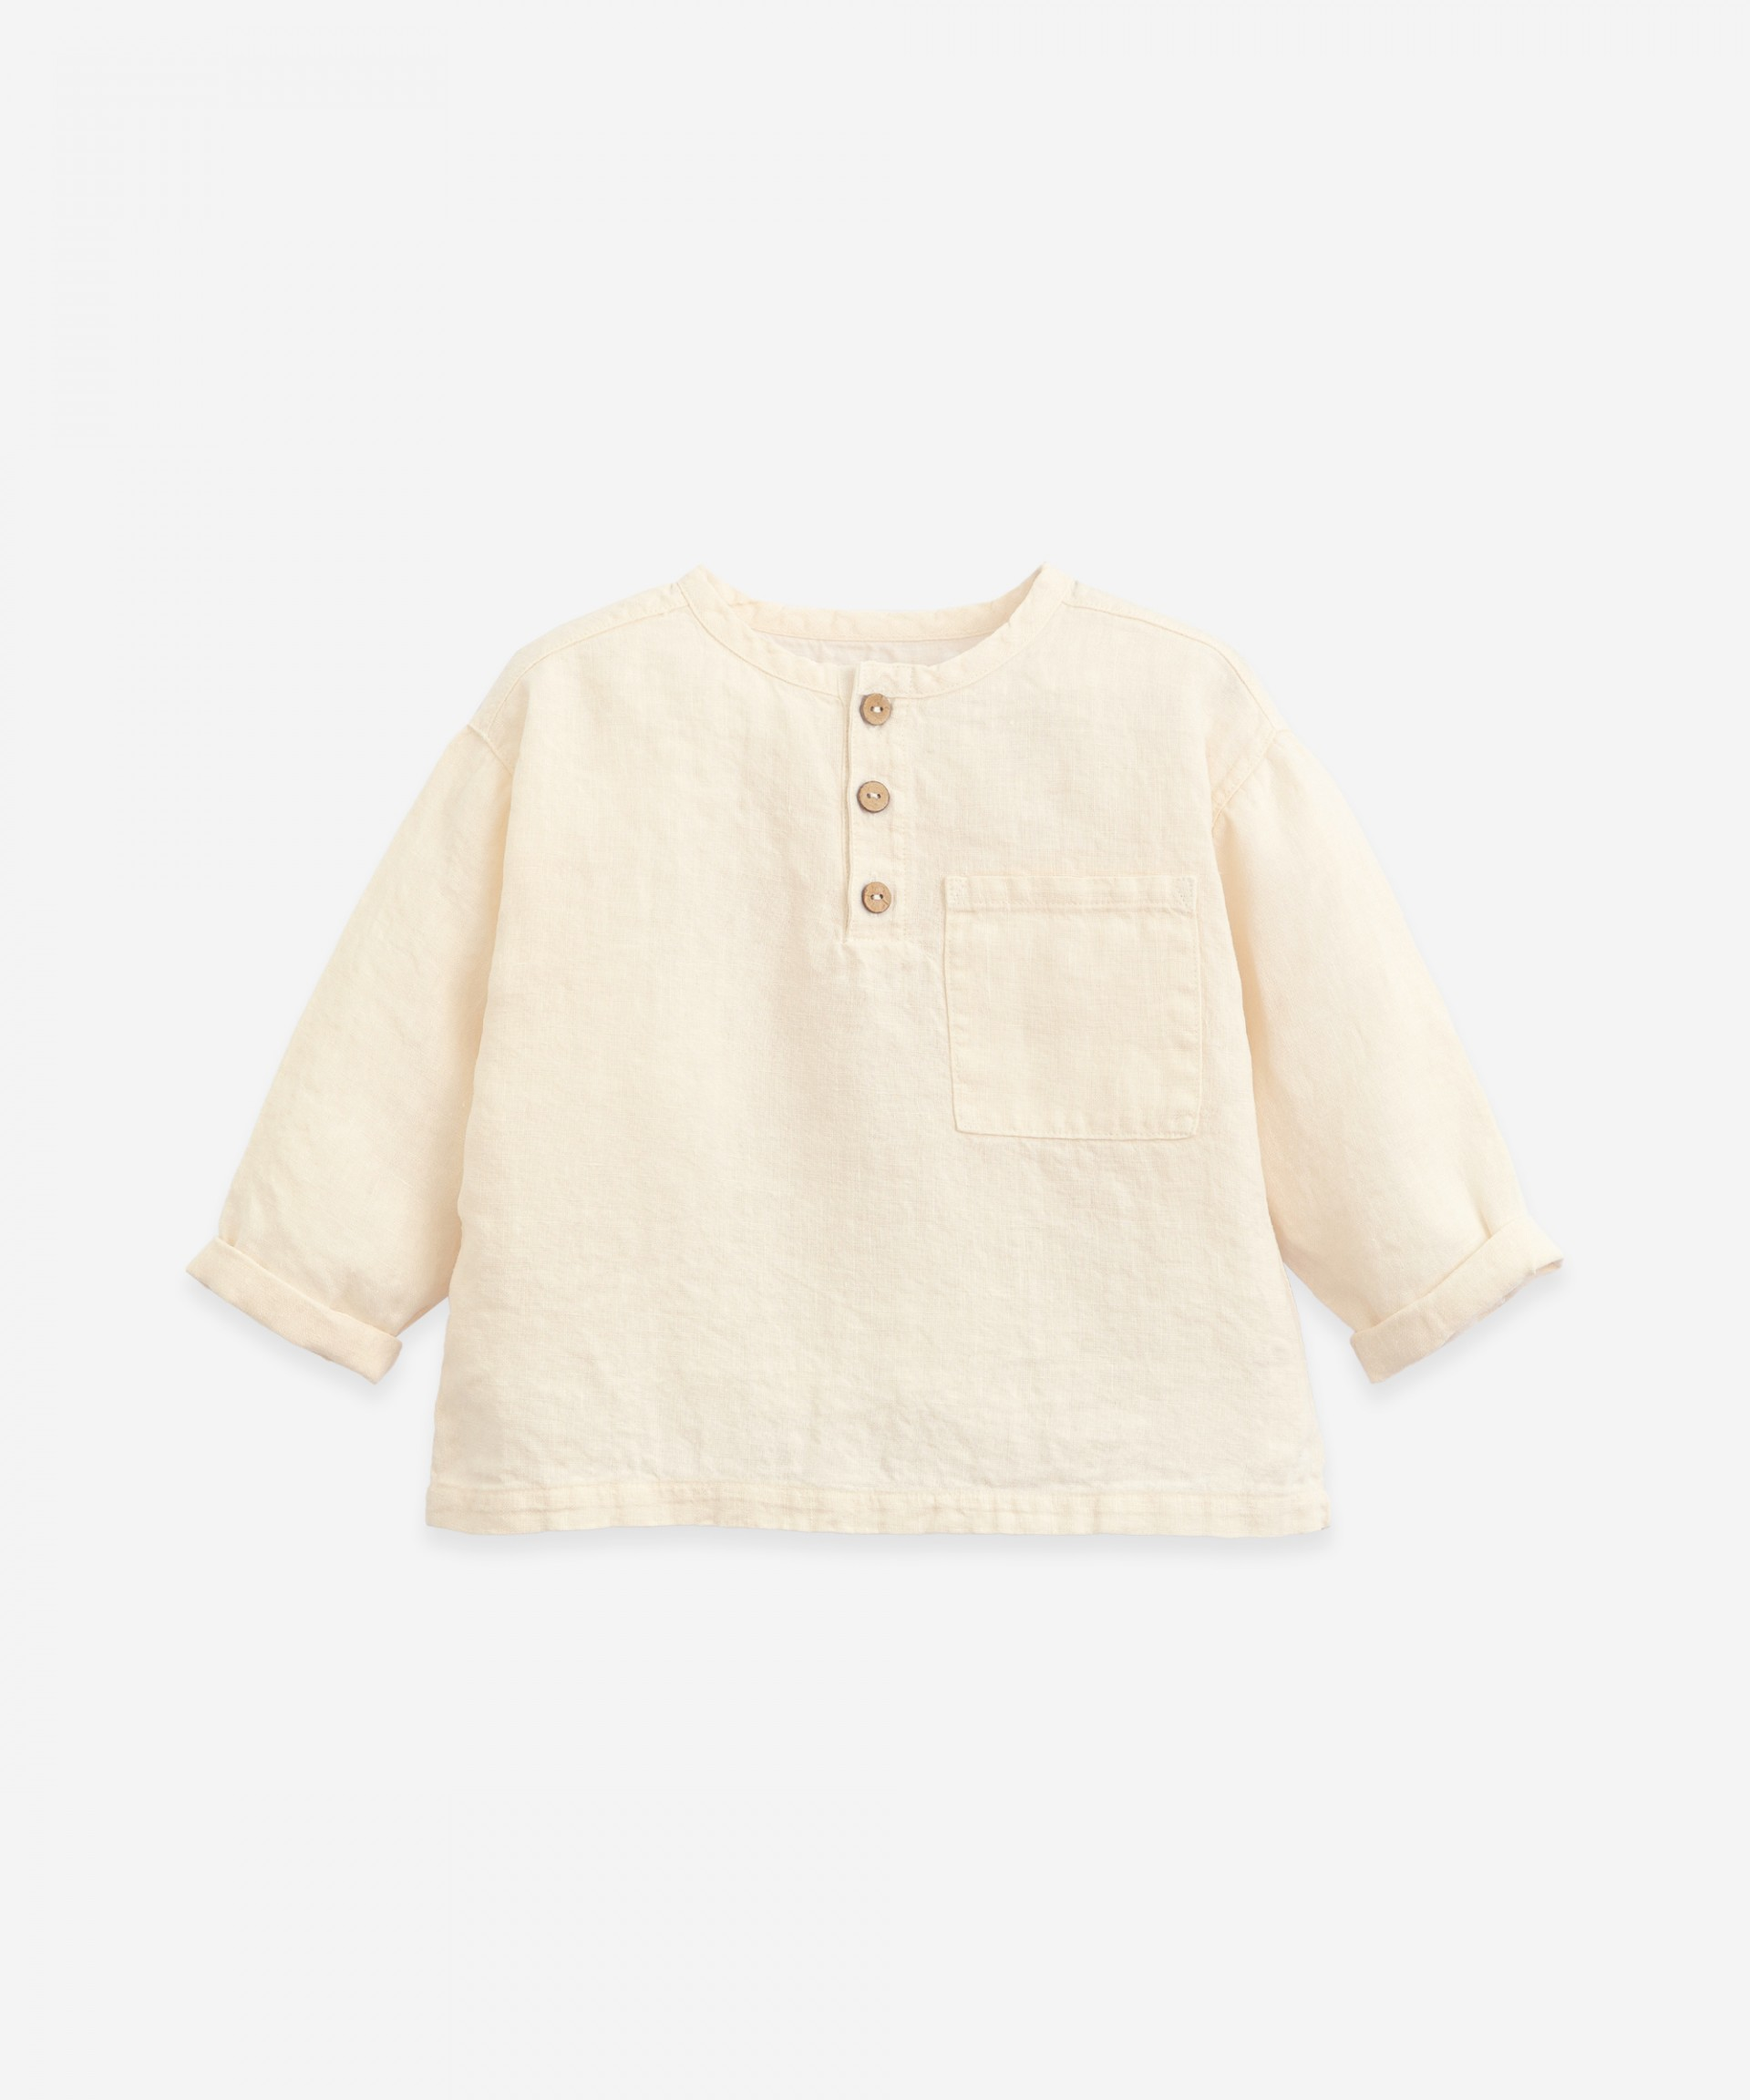 Camicia in lino con tasca | Botany